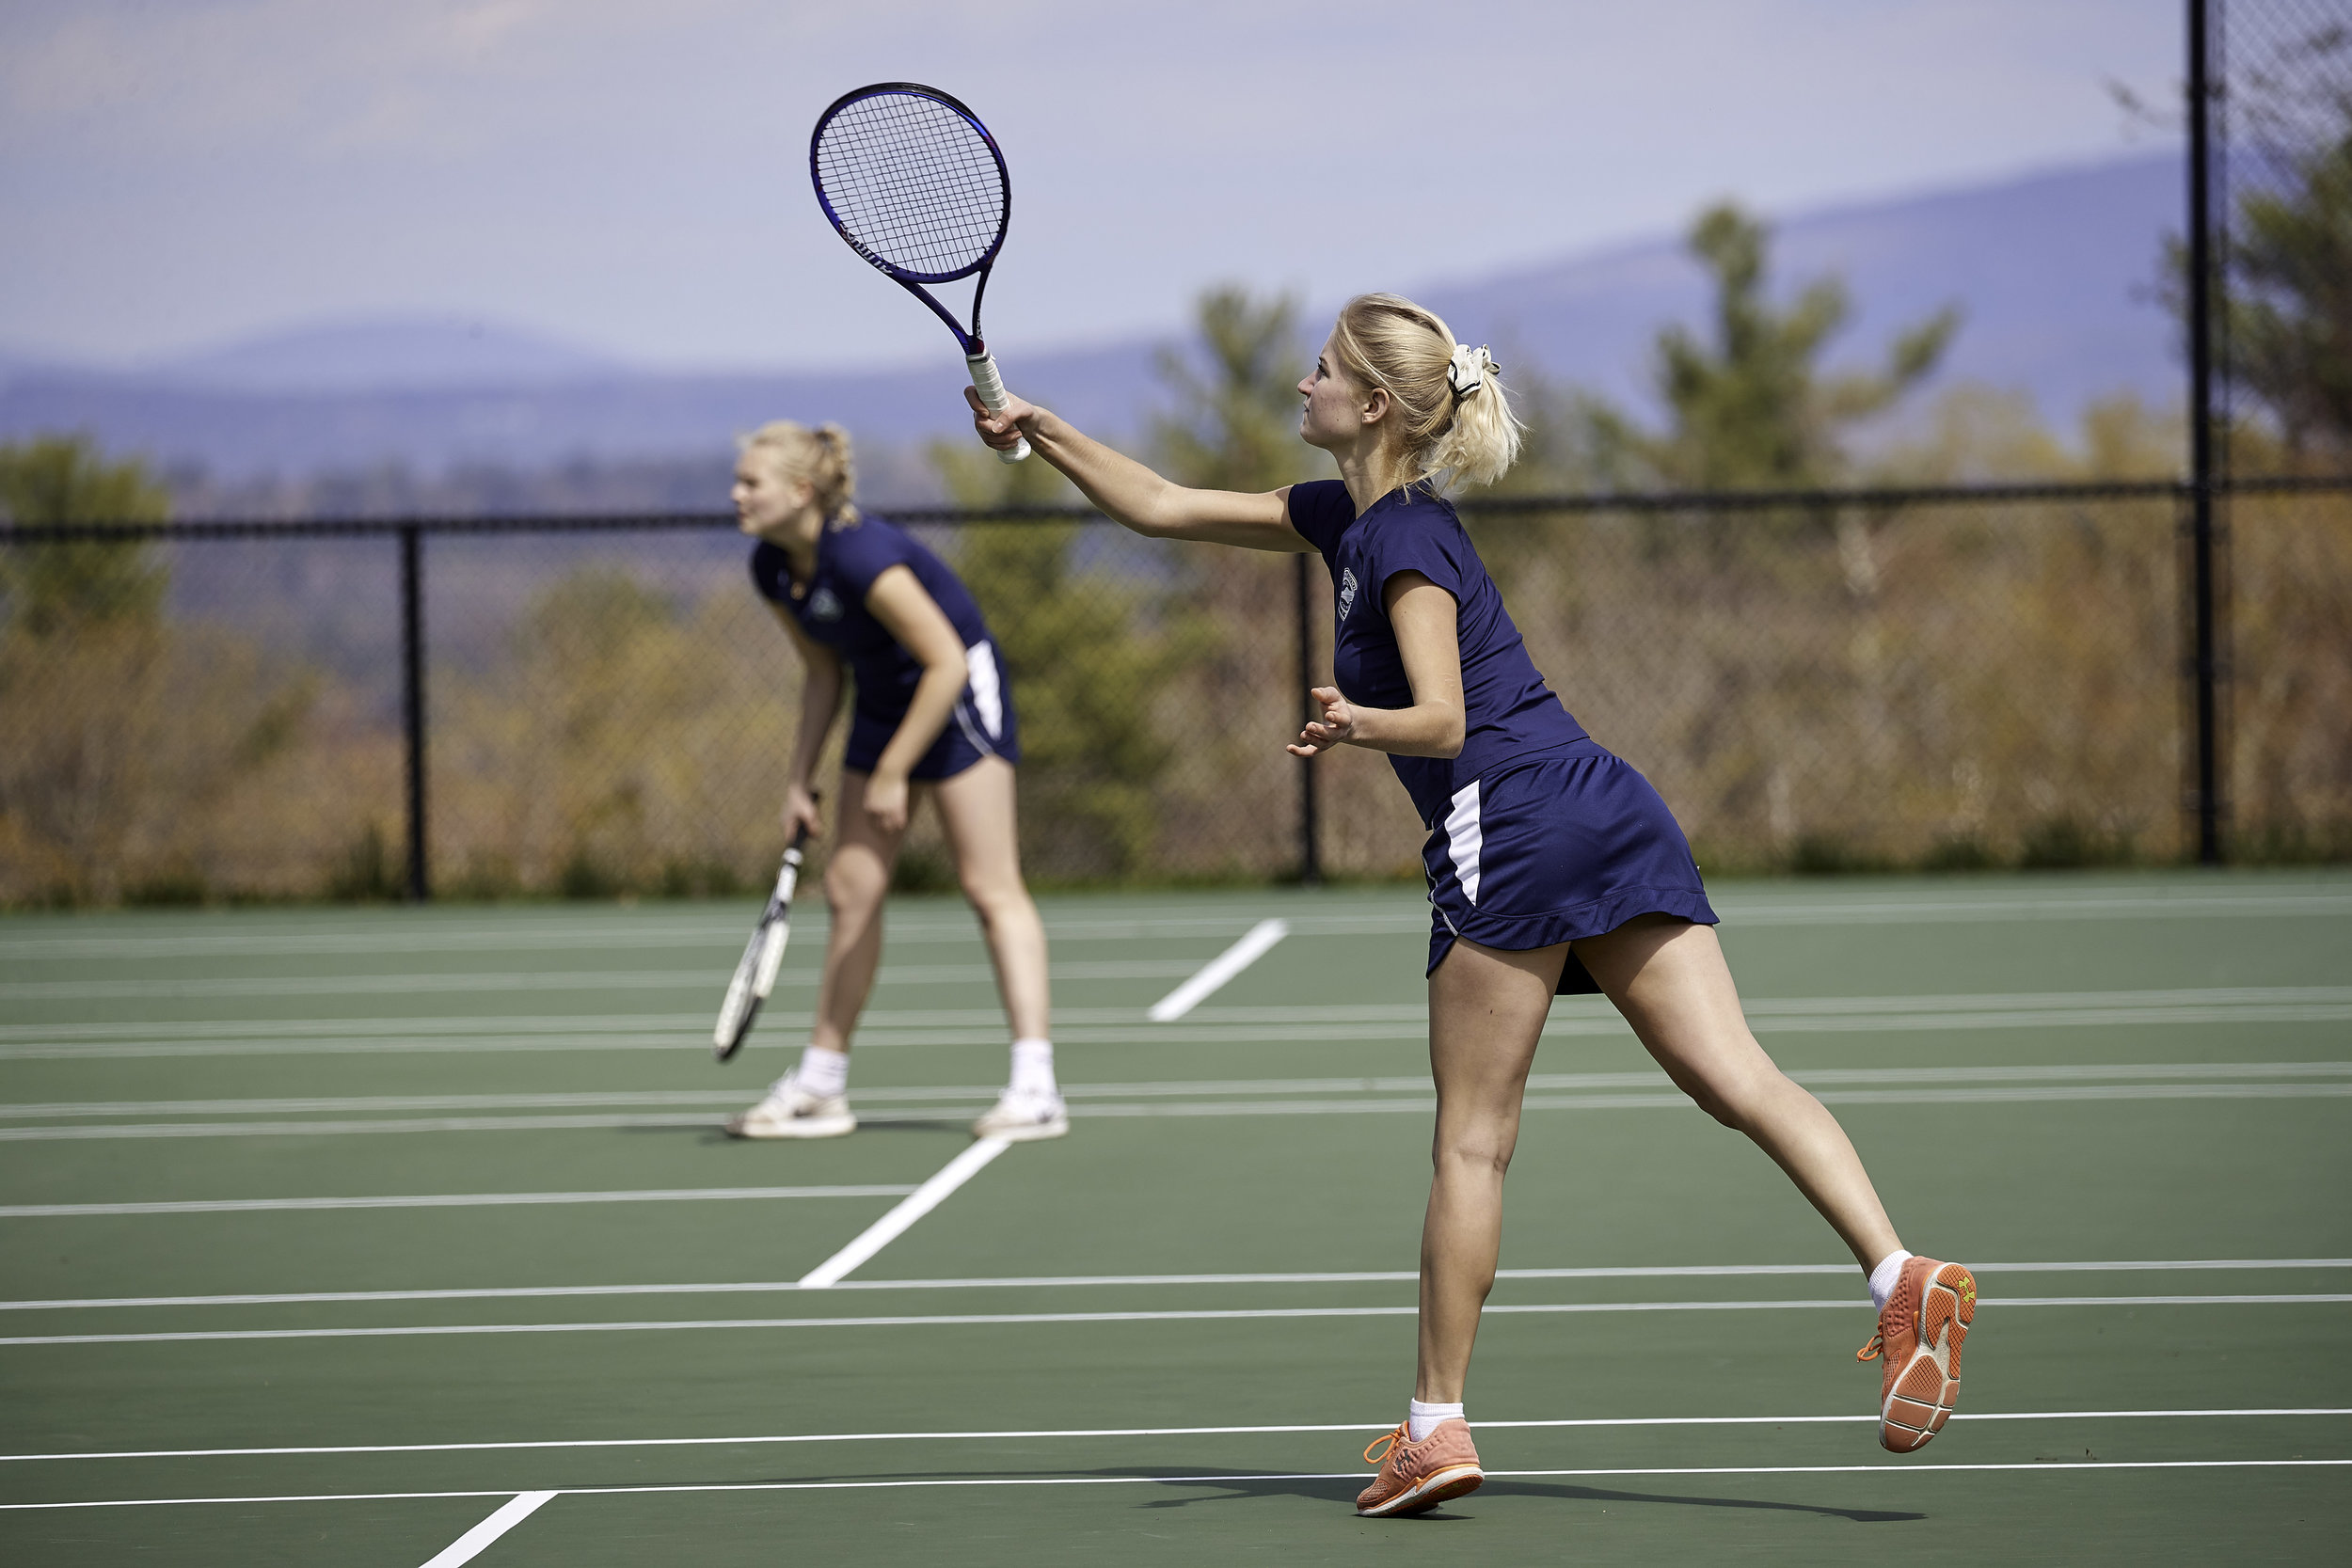 Girls Tennis vs. Winchendon School - May 15, 2019 -195176.jpg